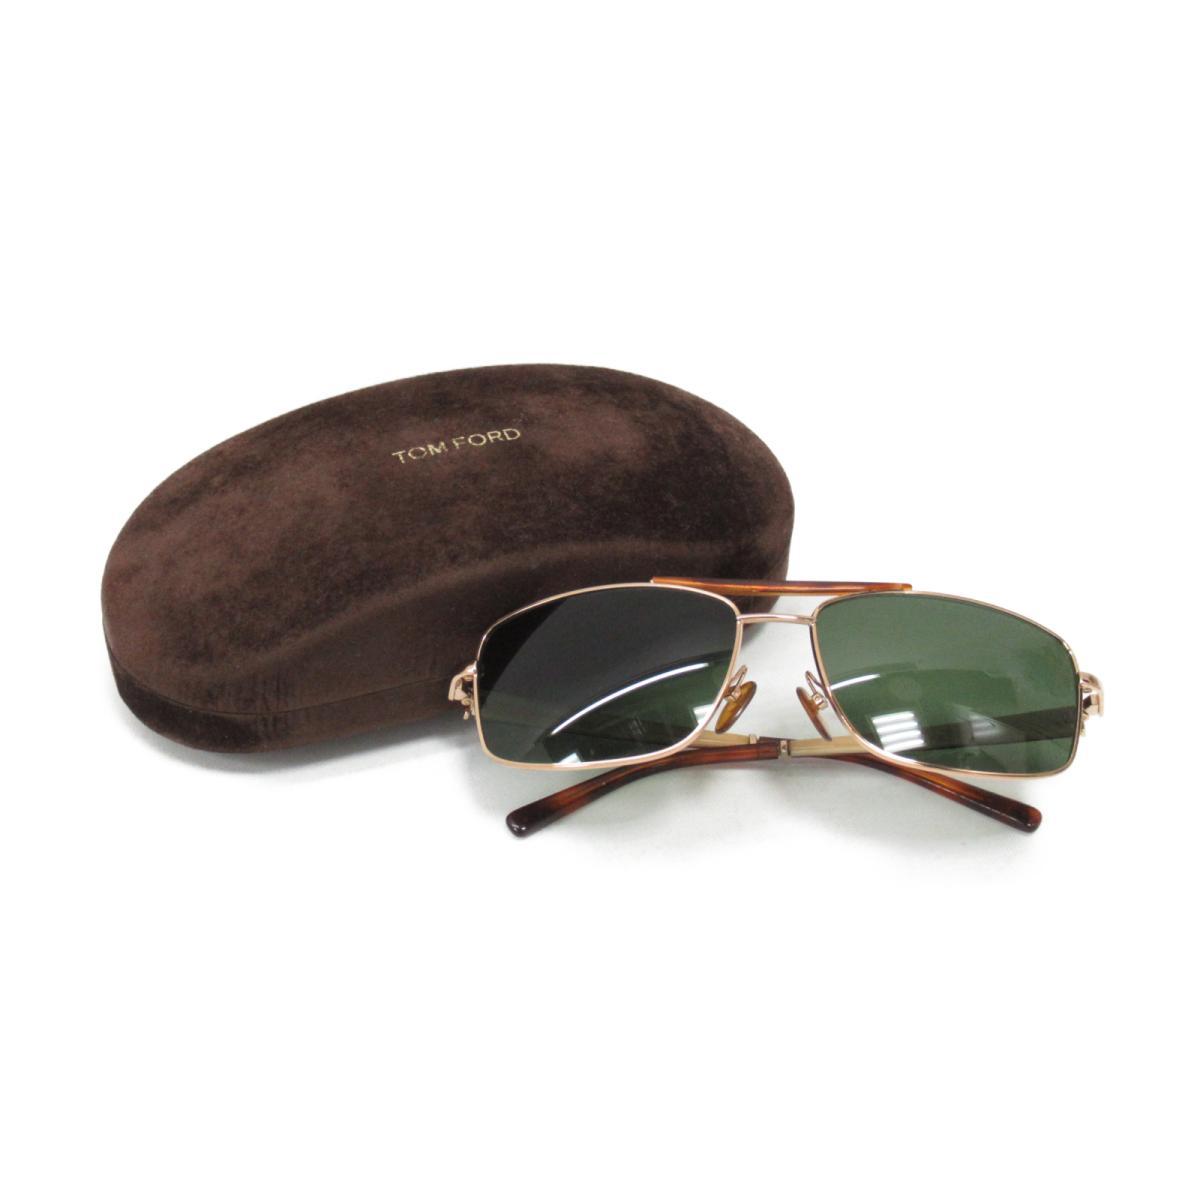 2bffc2e35ac Tom Ford sunglasses accessories men gap Dis plastic frame    lens of Brown  line